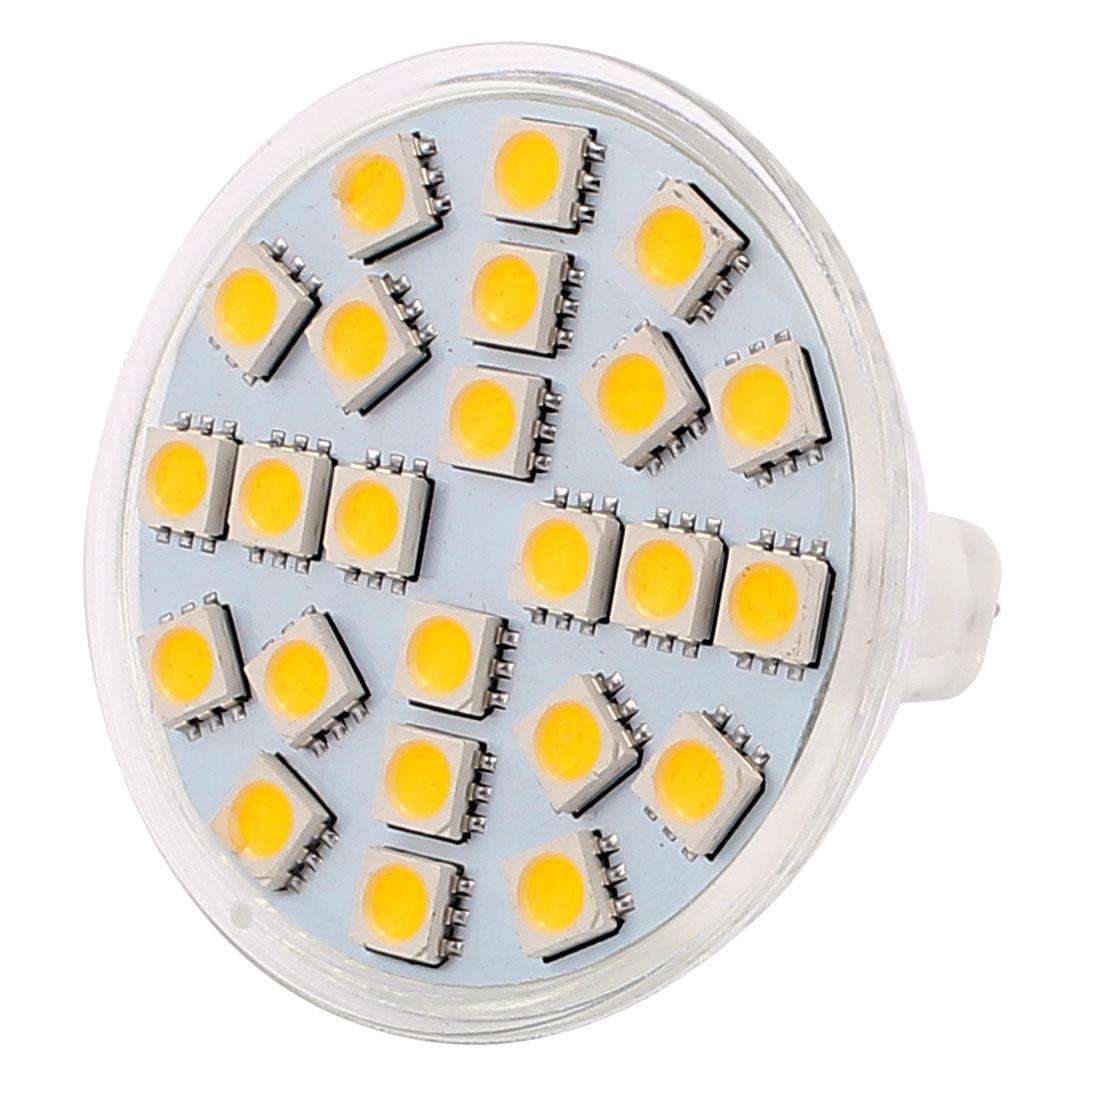 MR16 SMD 5050 24 LEDs Glass Energy Saving LED Lamp Bulb Warm White AC 110V 3W